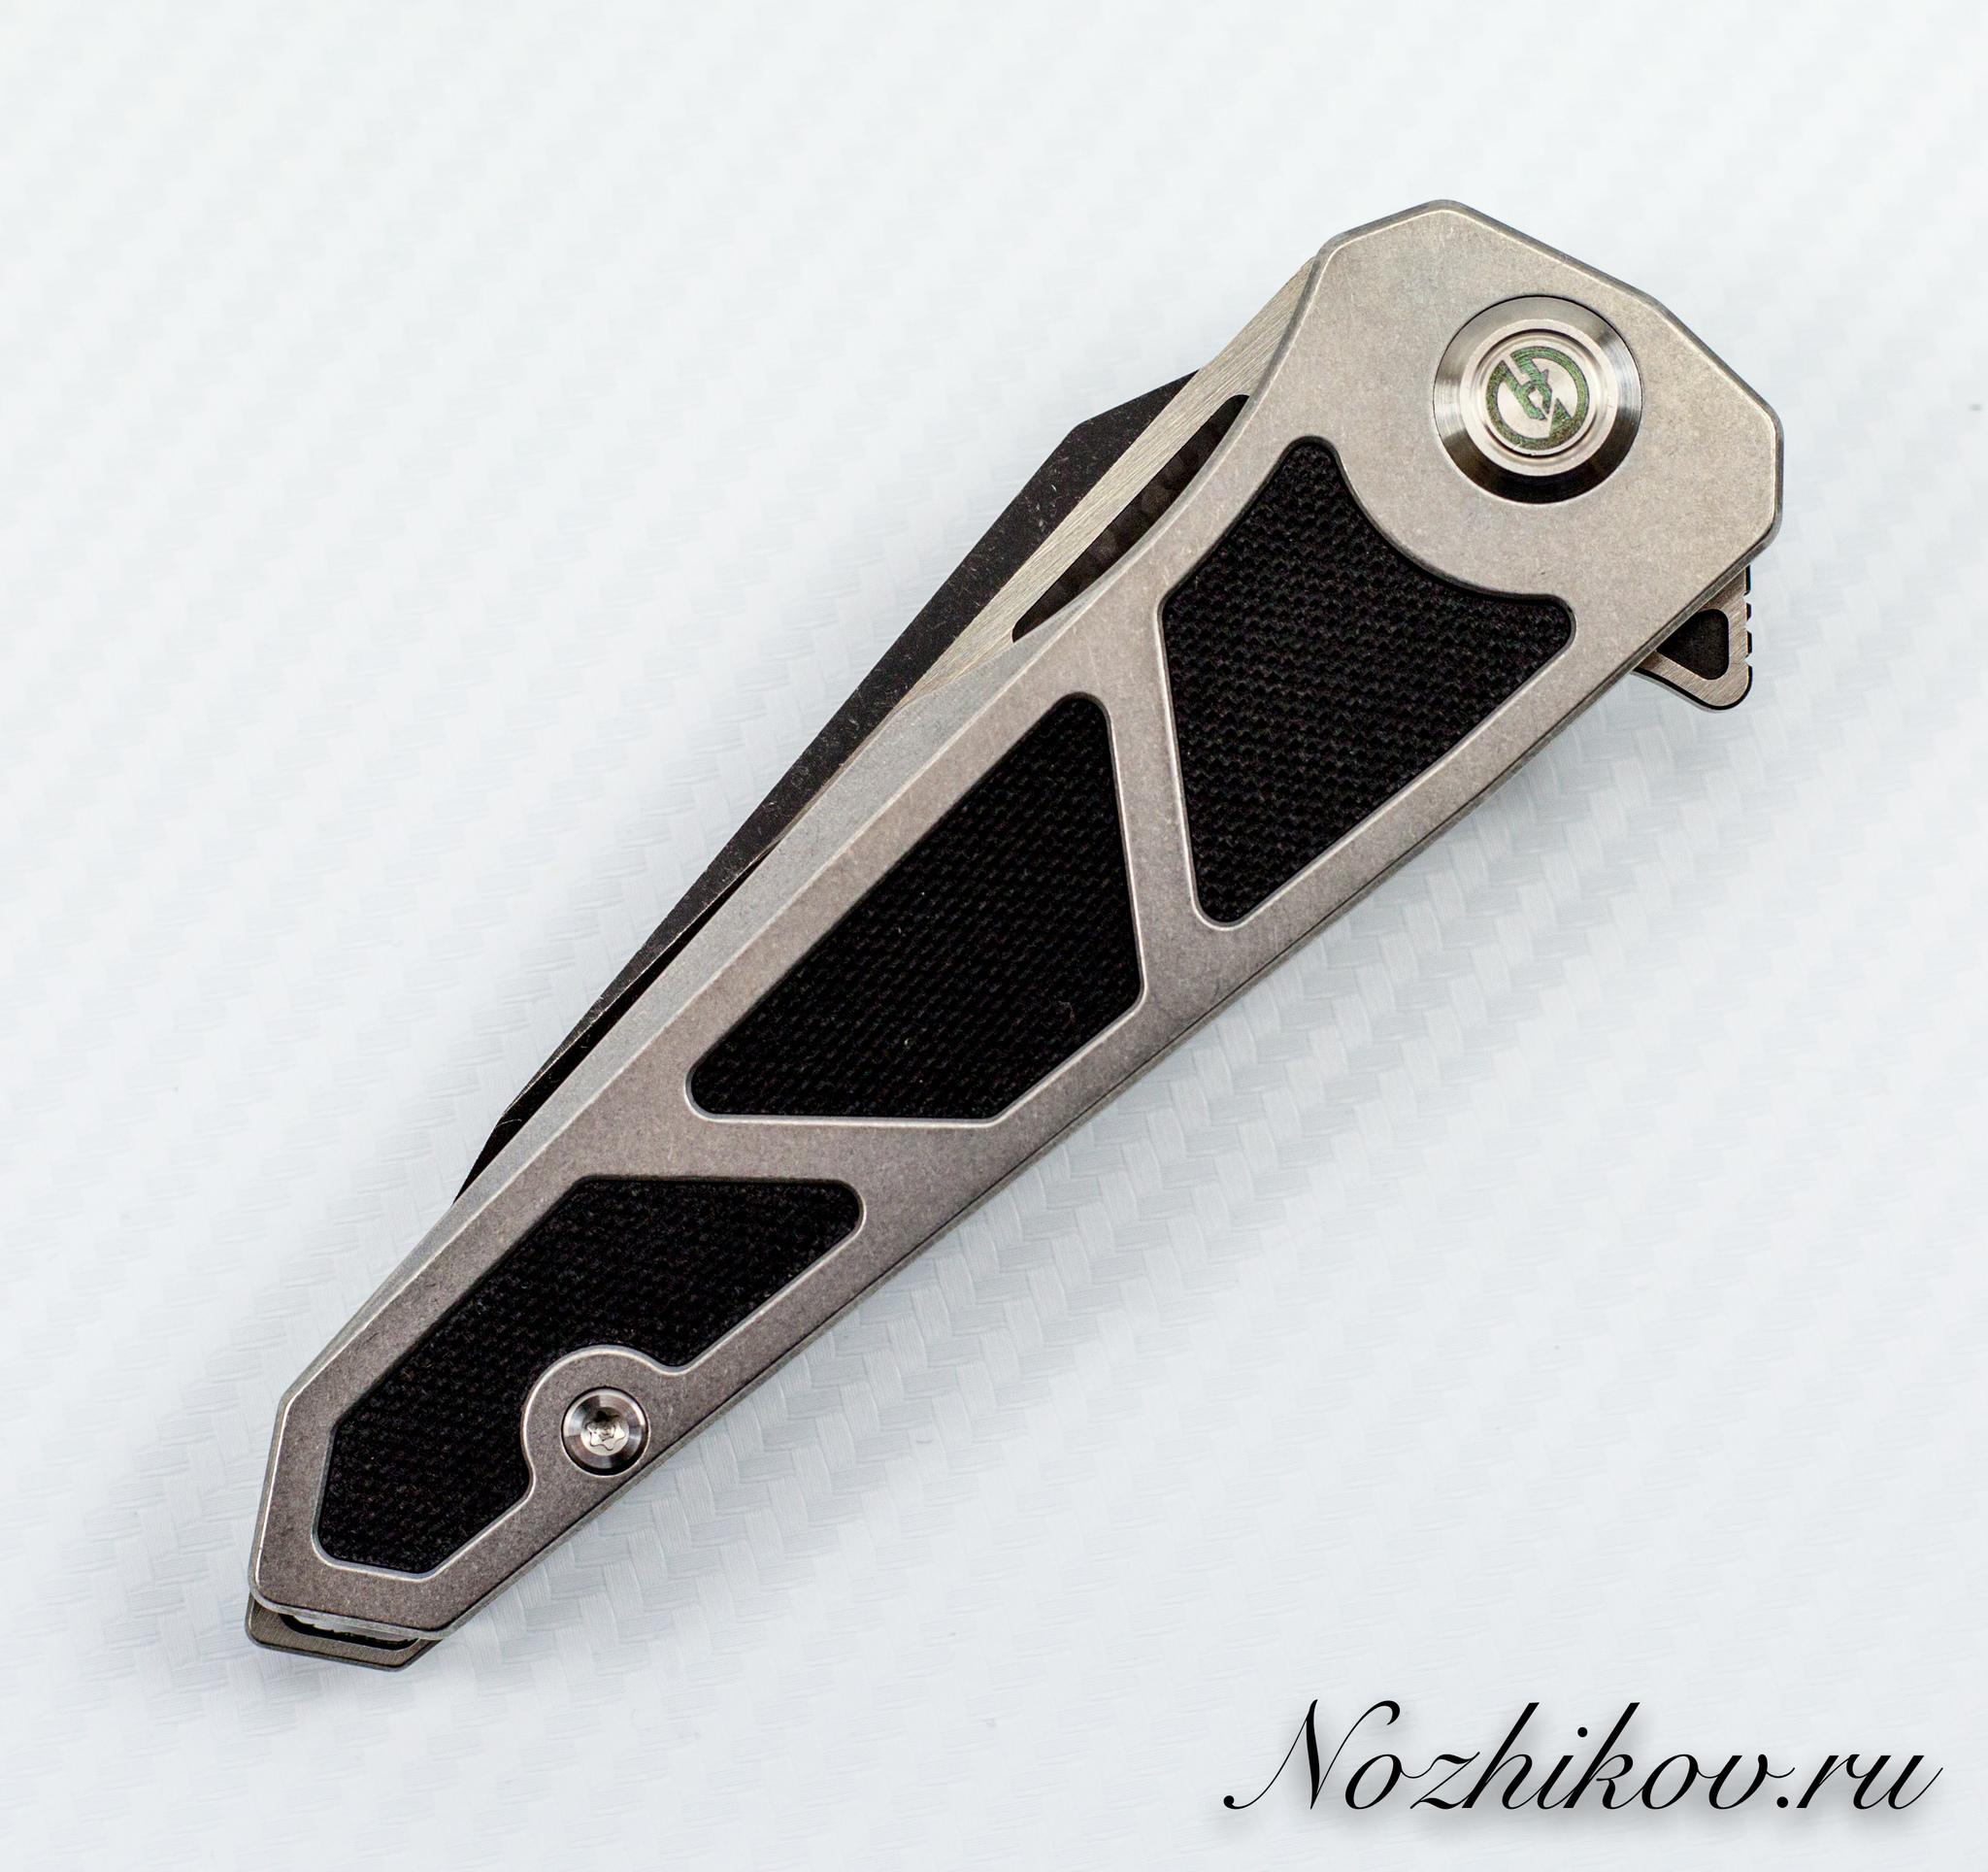 Складной нож Maxace Lanius Black, сталь 14C28N